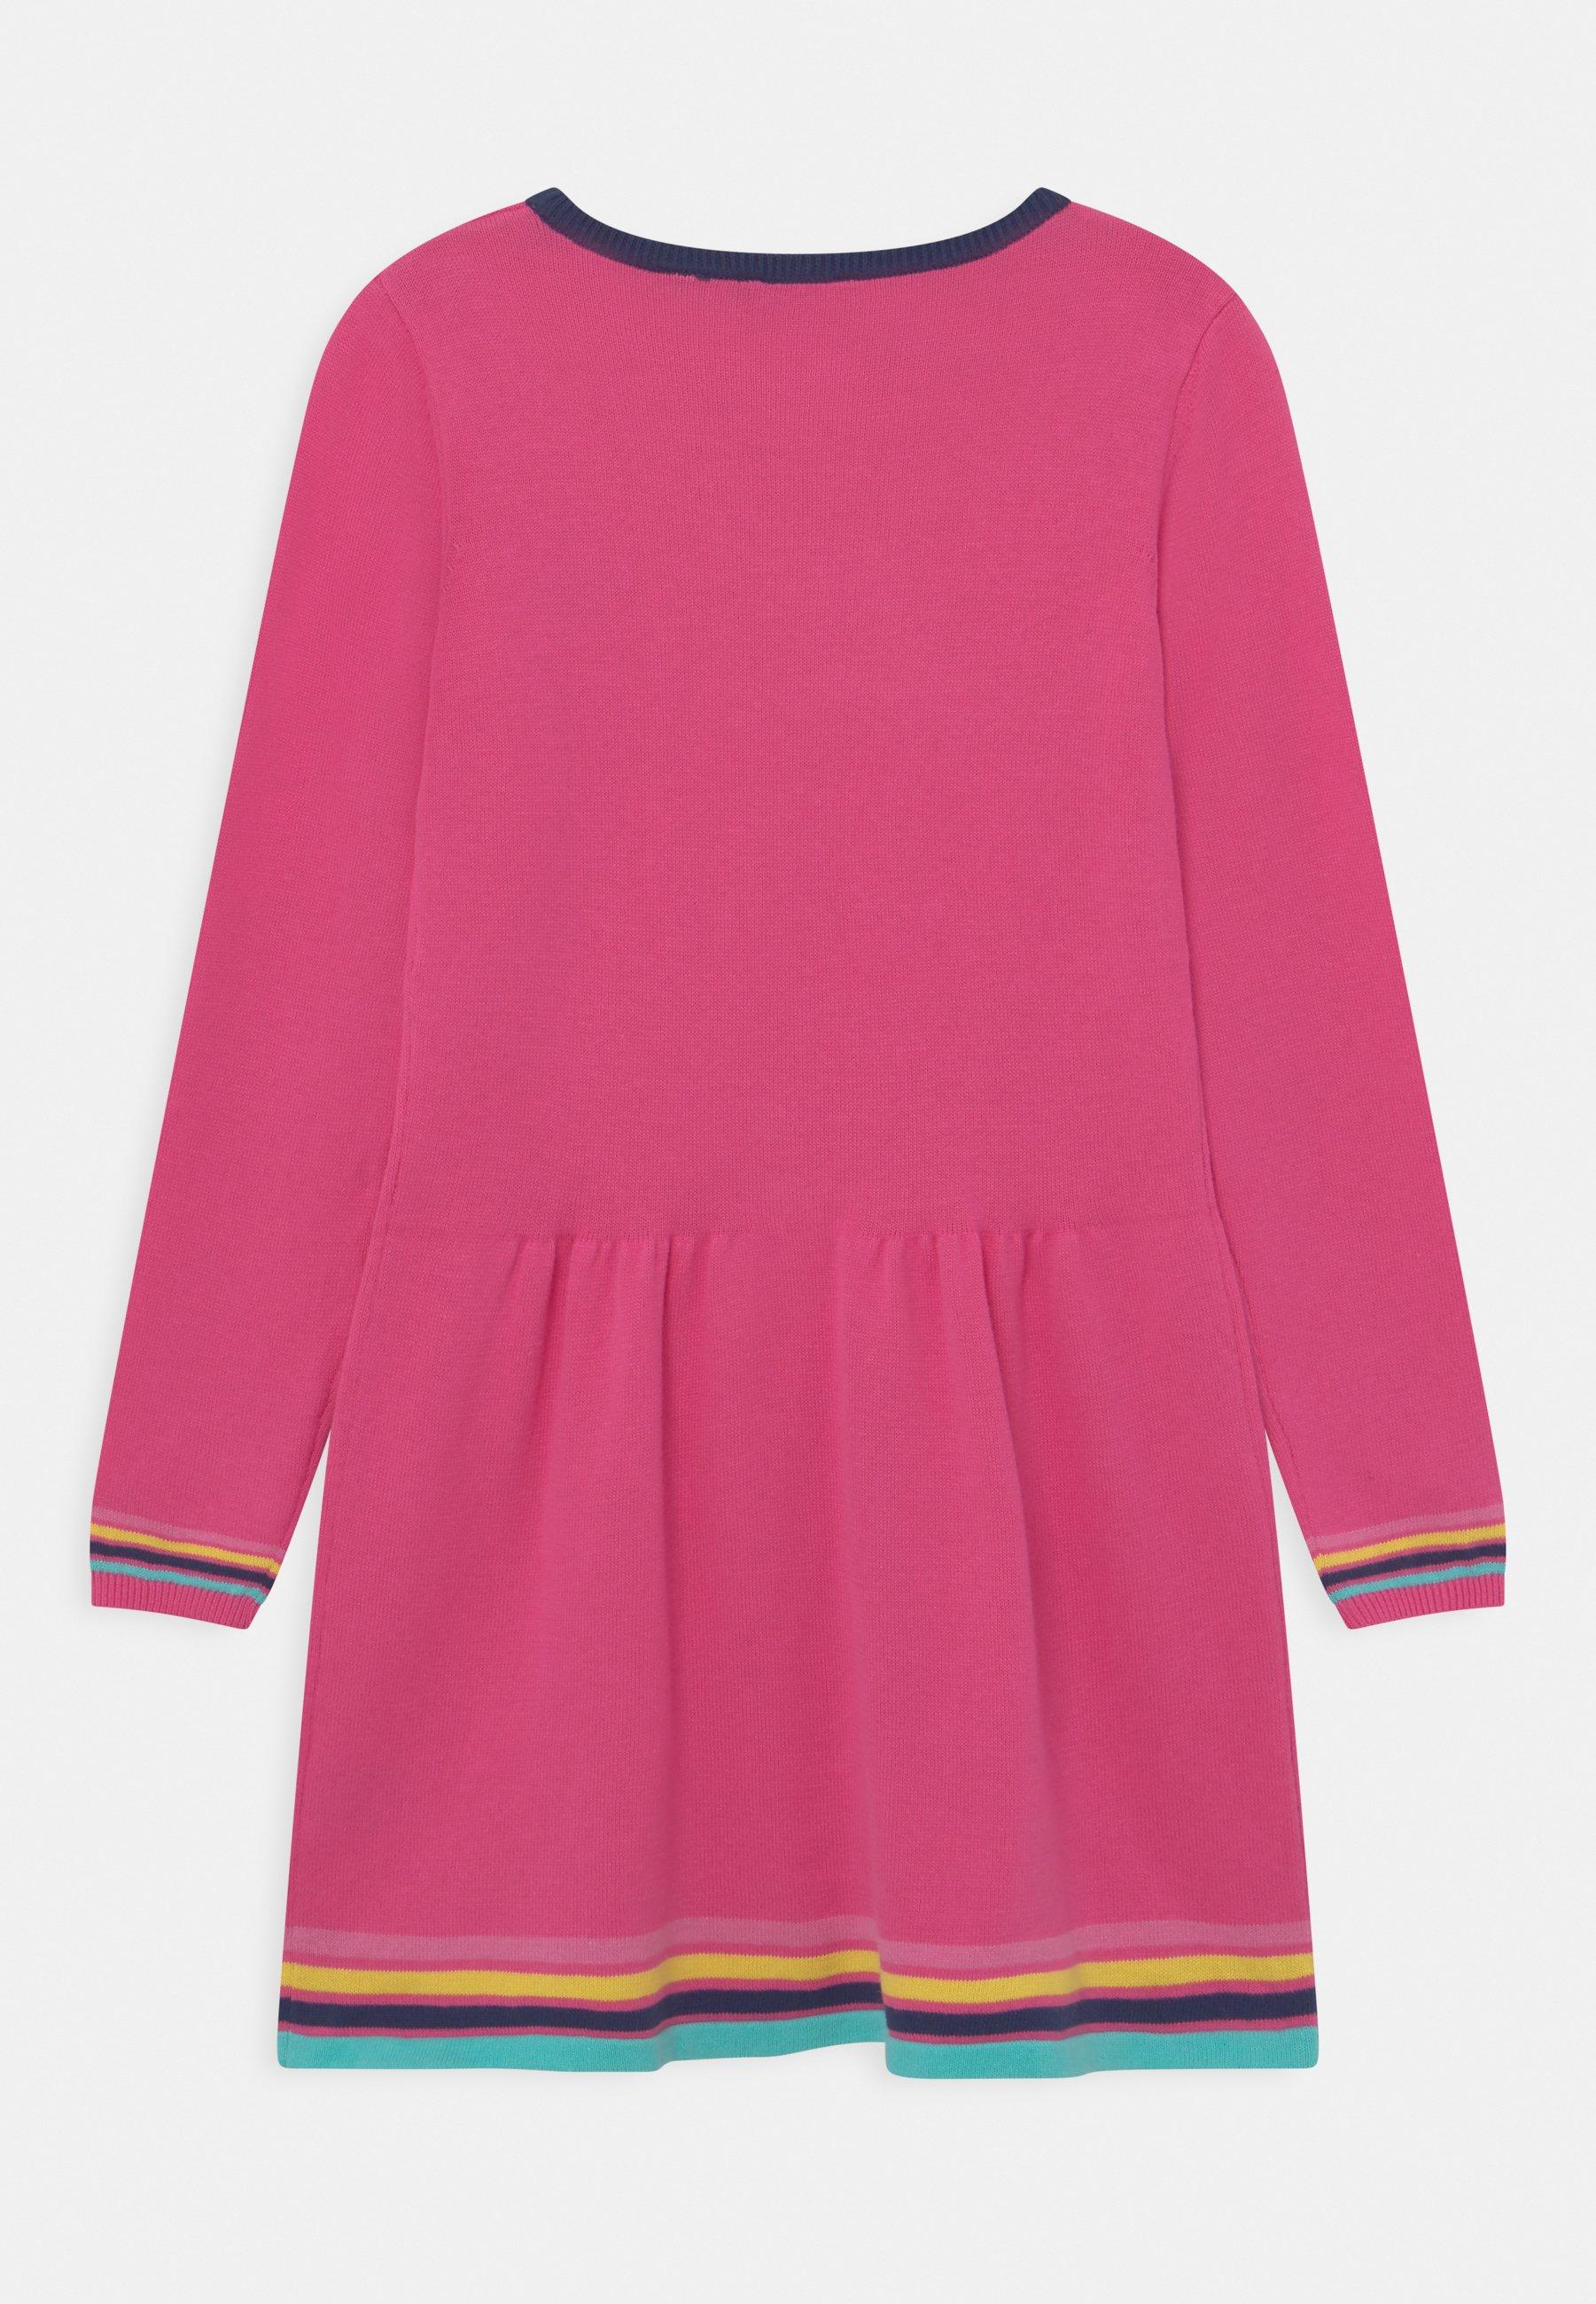 Kids KIDS GIRLS DRESS, - Jumper dress